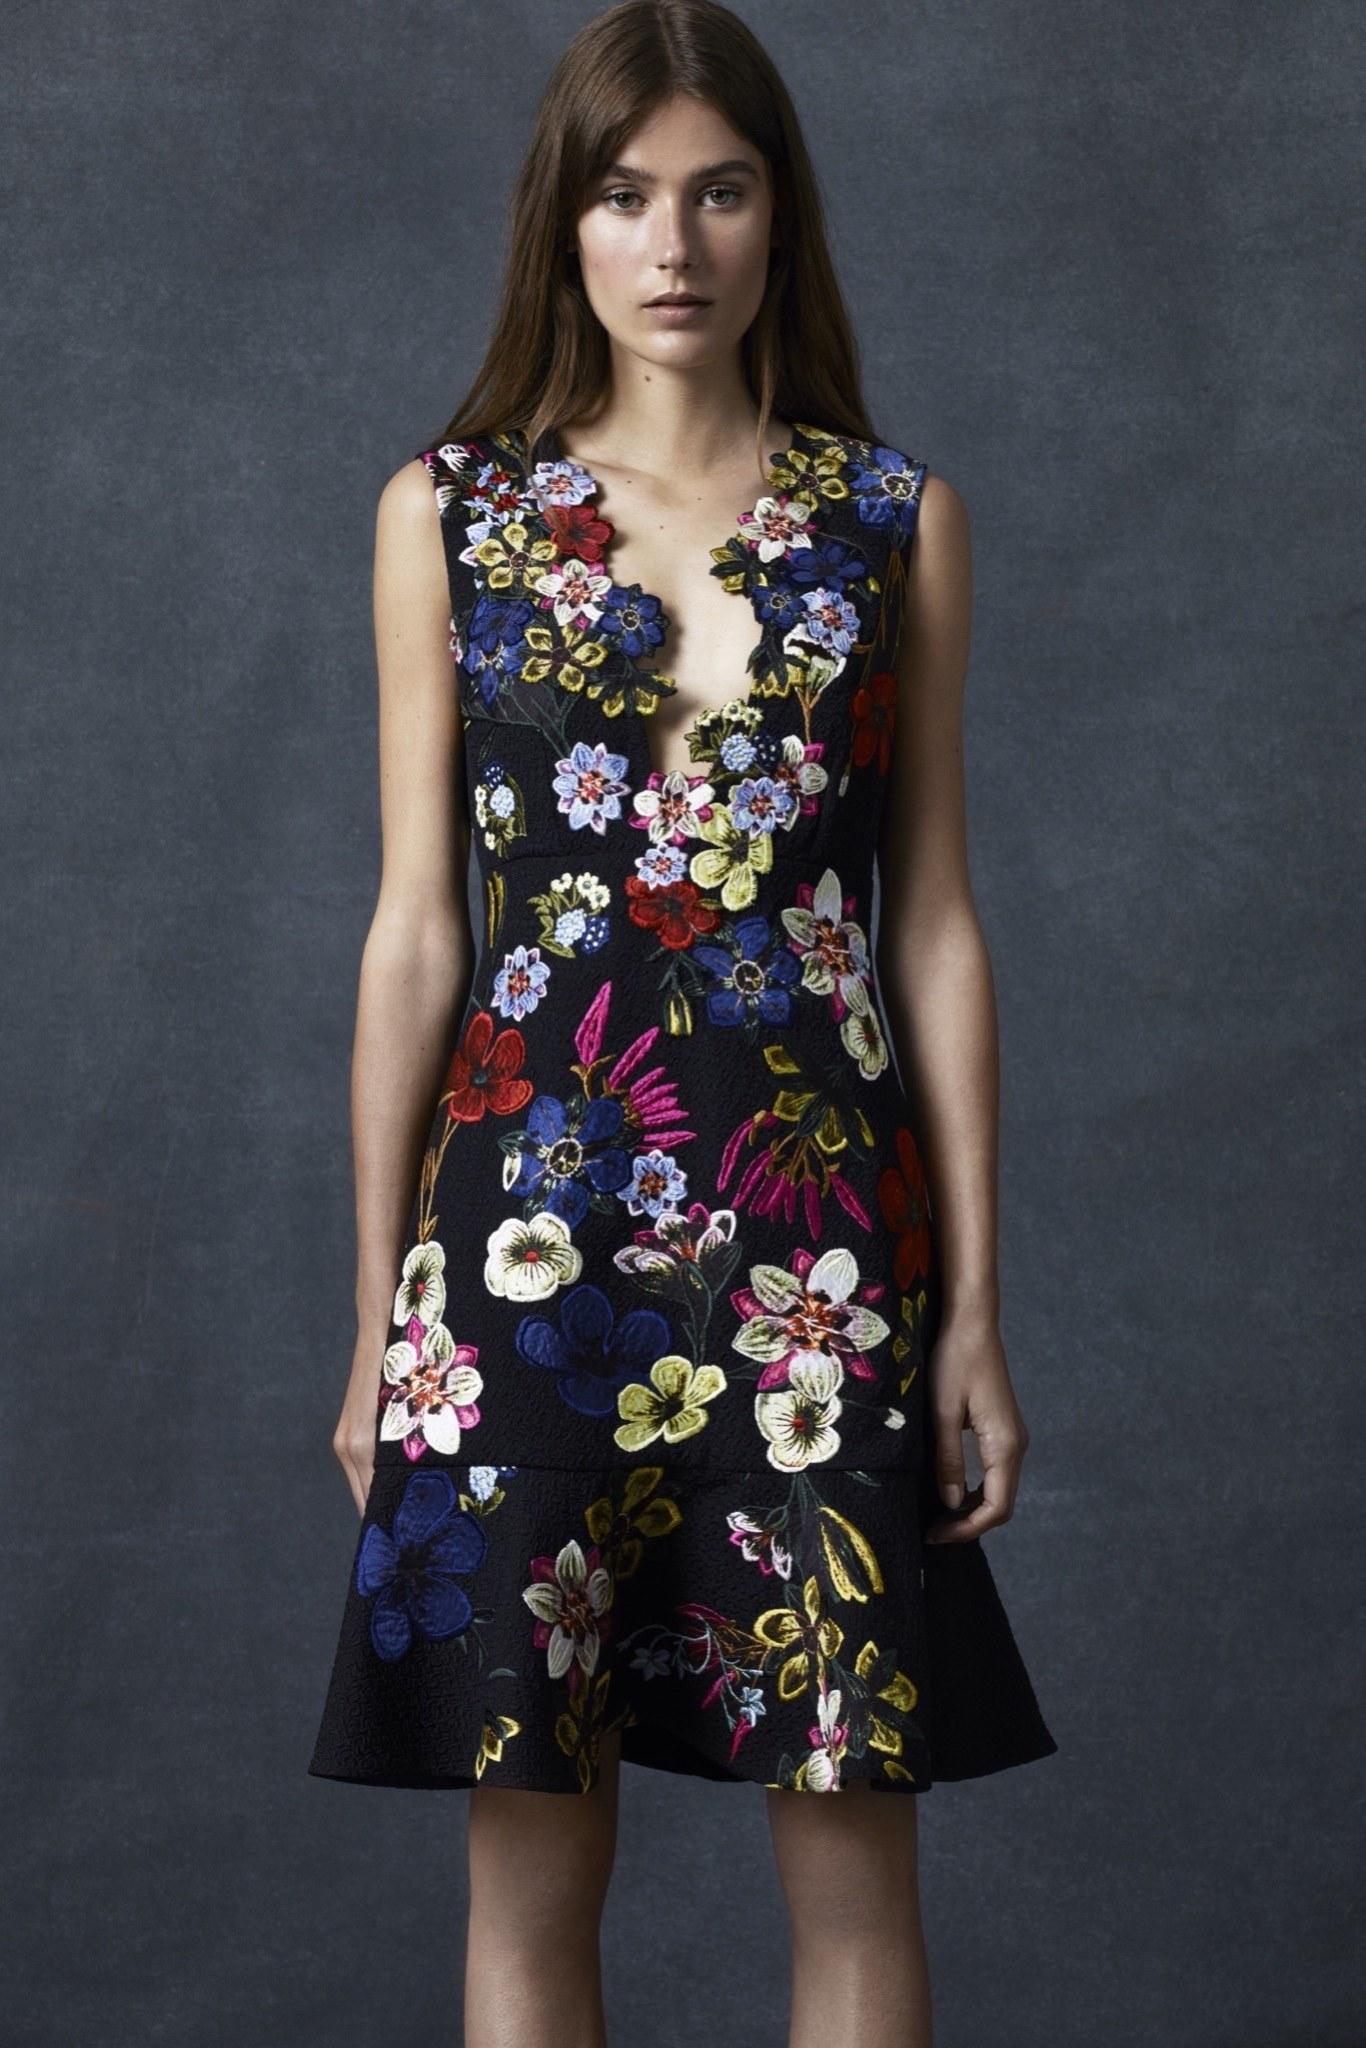 Inspiring Erdem Dress | Miraculous Erdem Fashion Designer